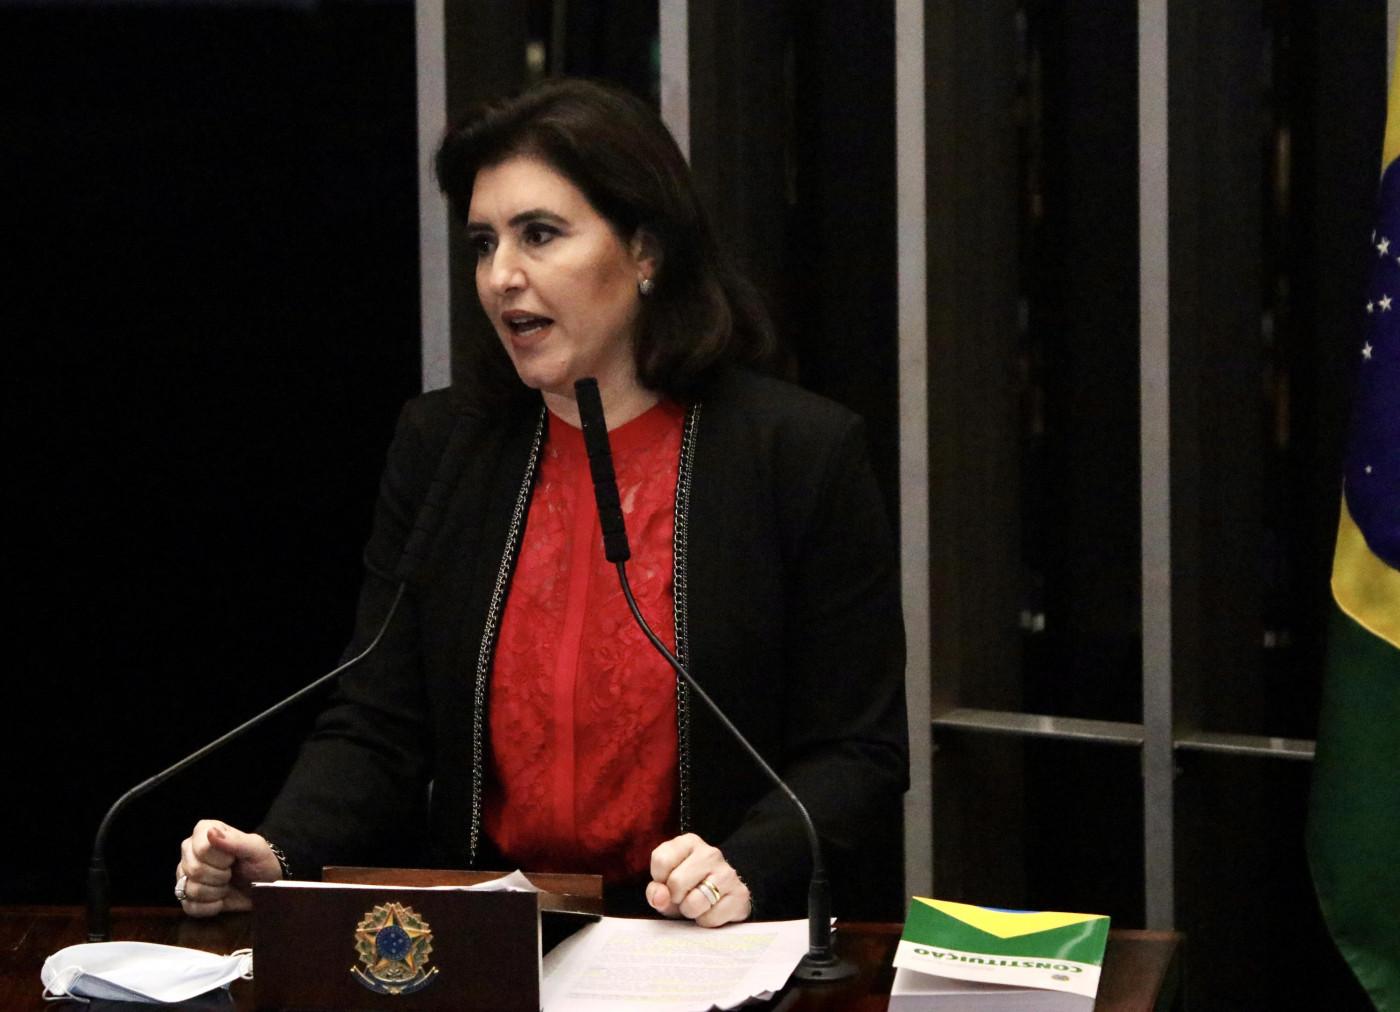 Senadora Simone Tebet